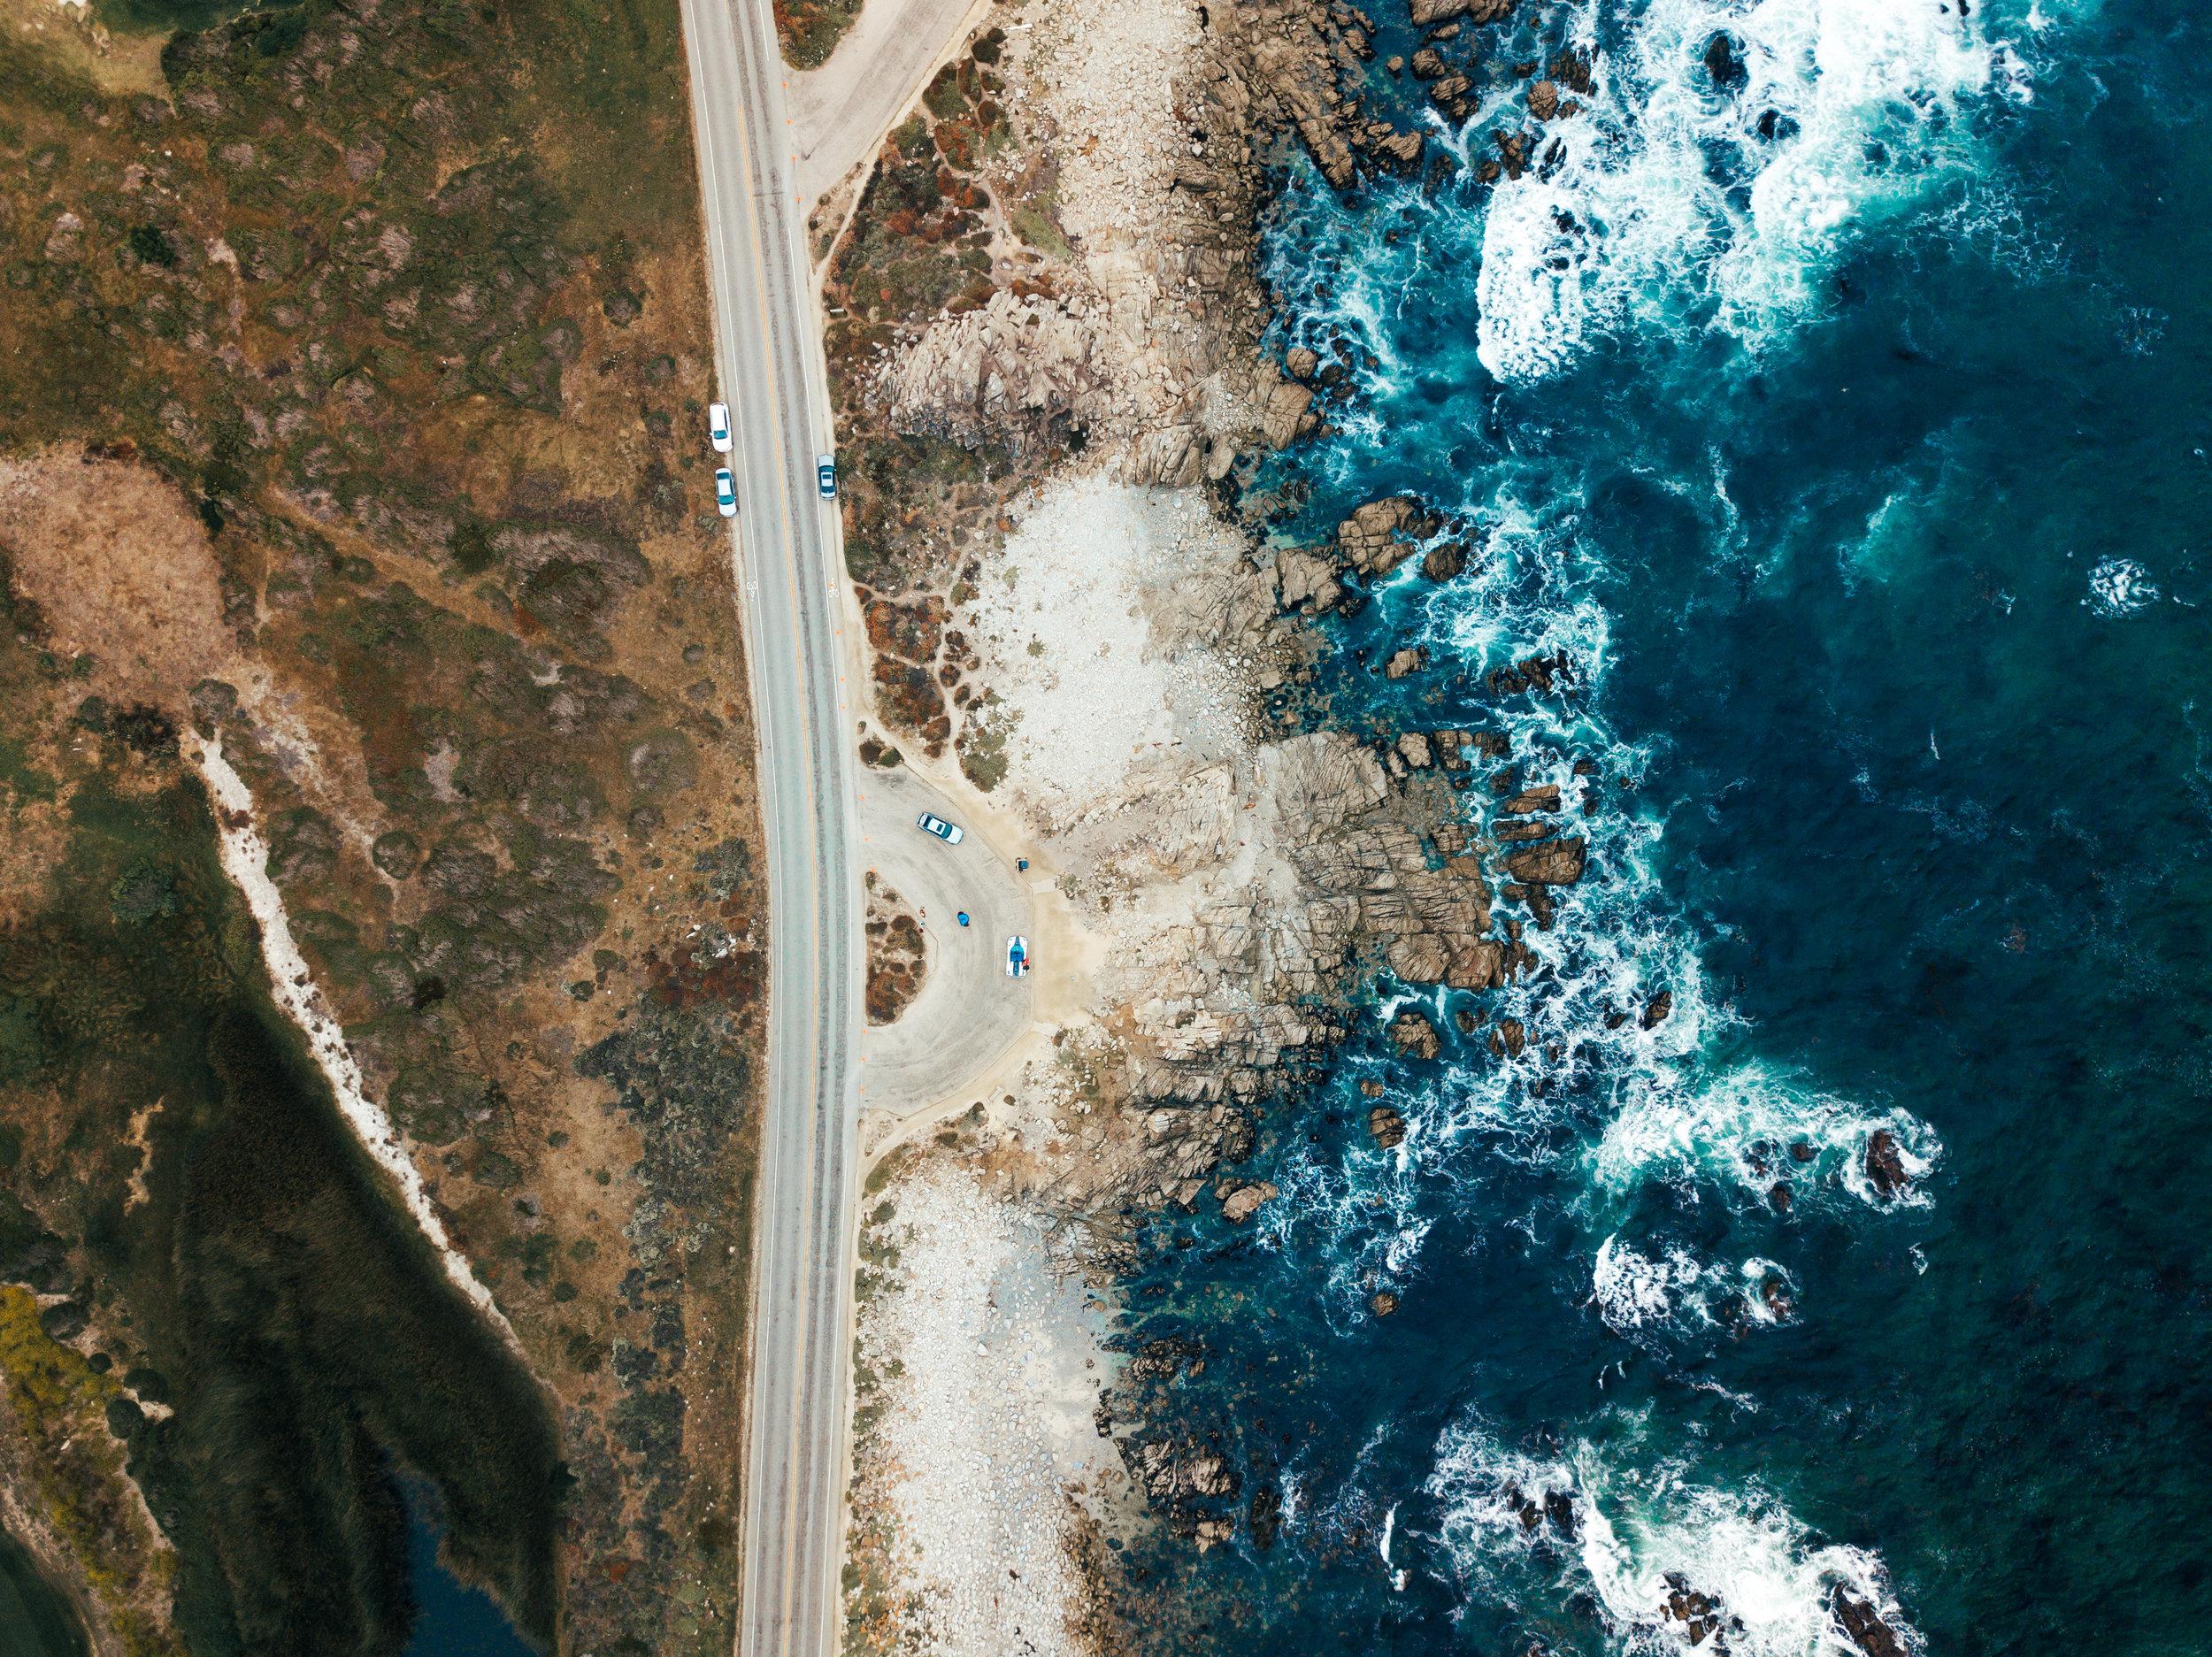 Stay_Driven_Monterey_Car_Week_Whitesse_Koenigsegg-9.jpg